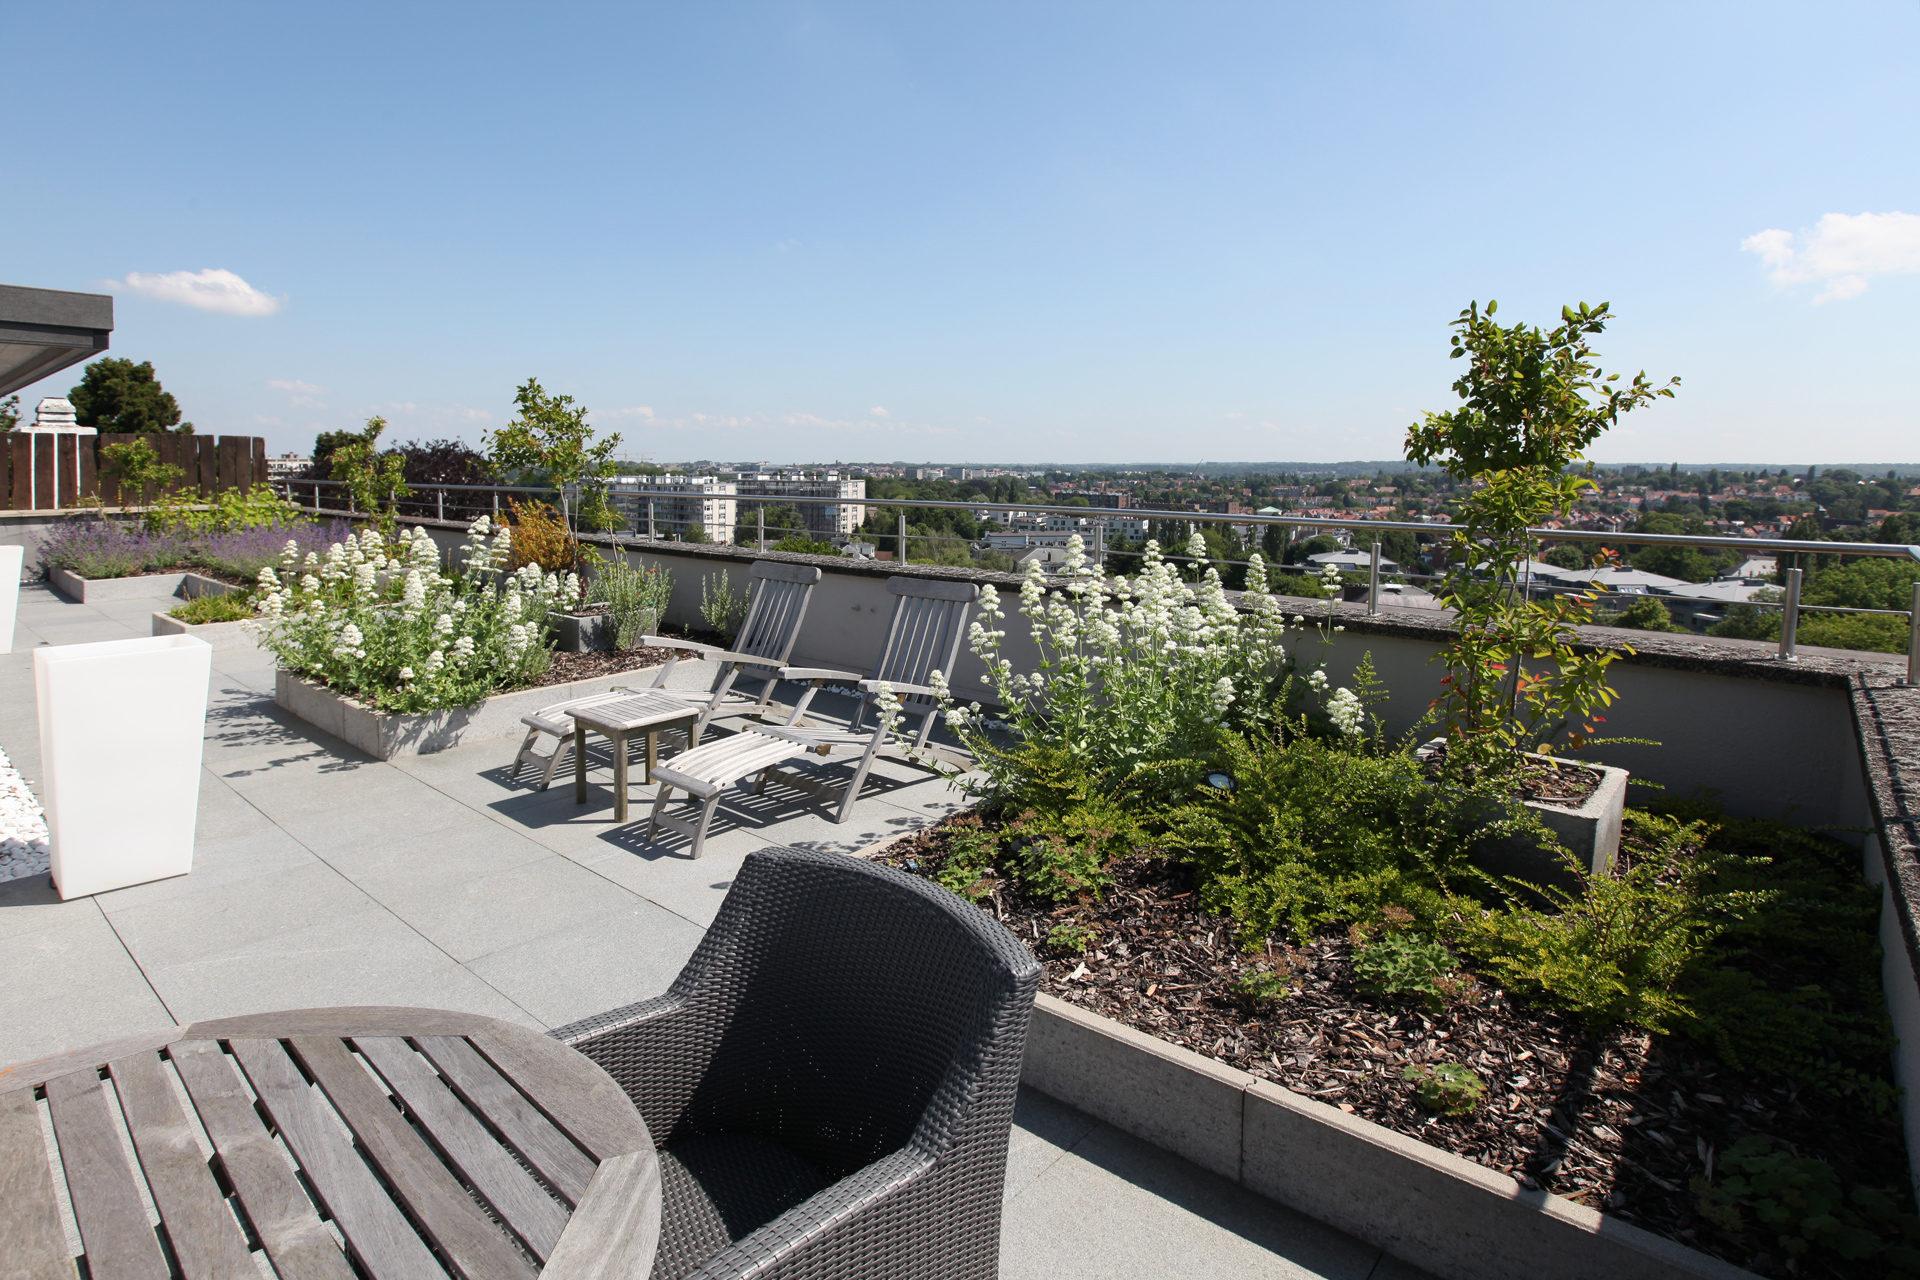 Dakterras design simple luxe dakterras juist omdat daken vaker